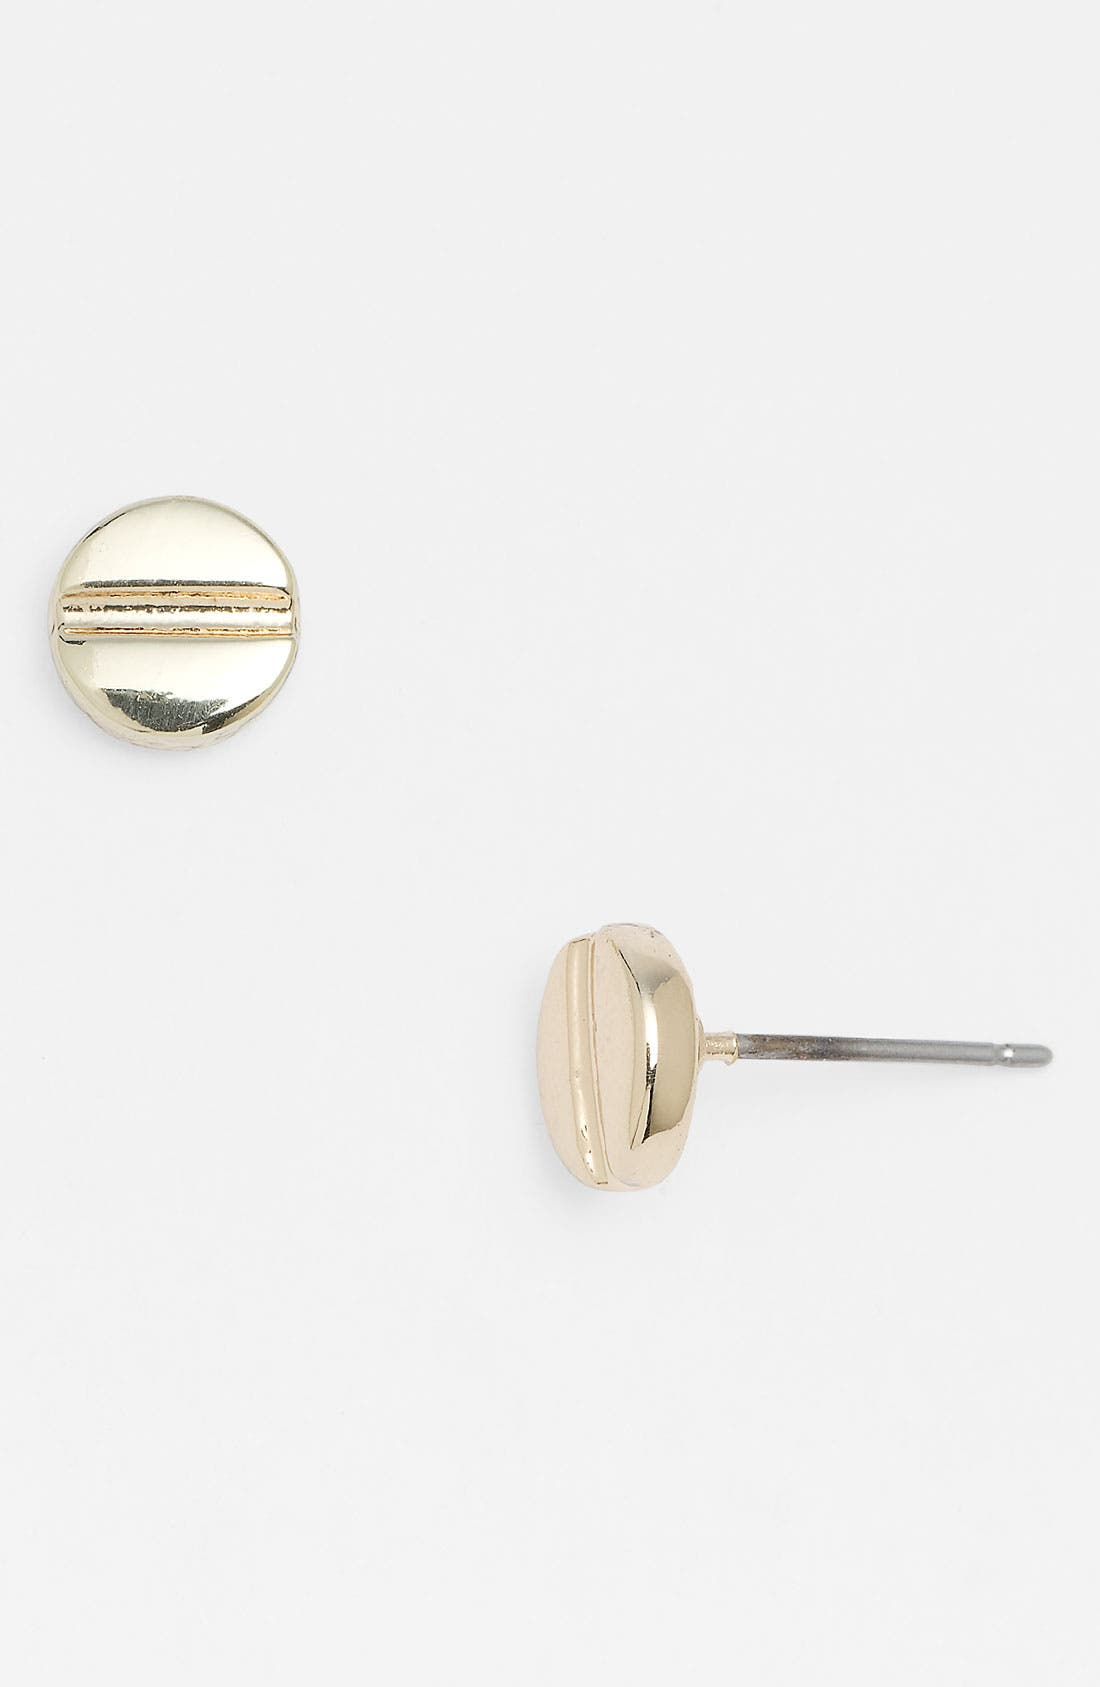 Alternate Image 1 Selected - Vince Camuto 'Basics' Stud Earrings